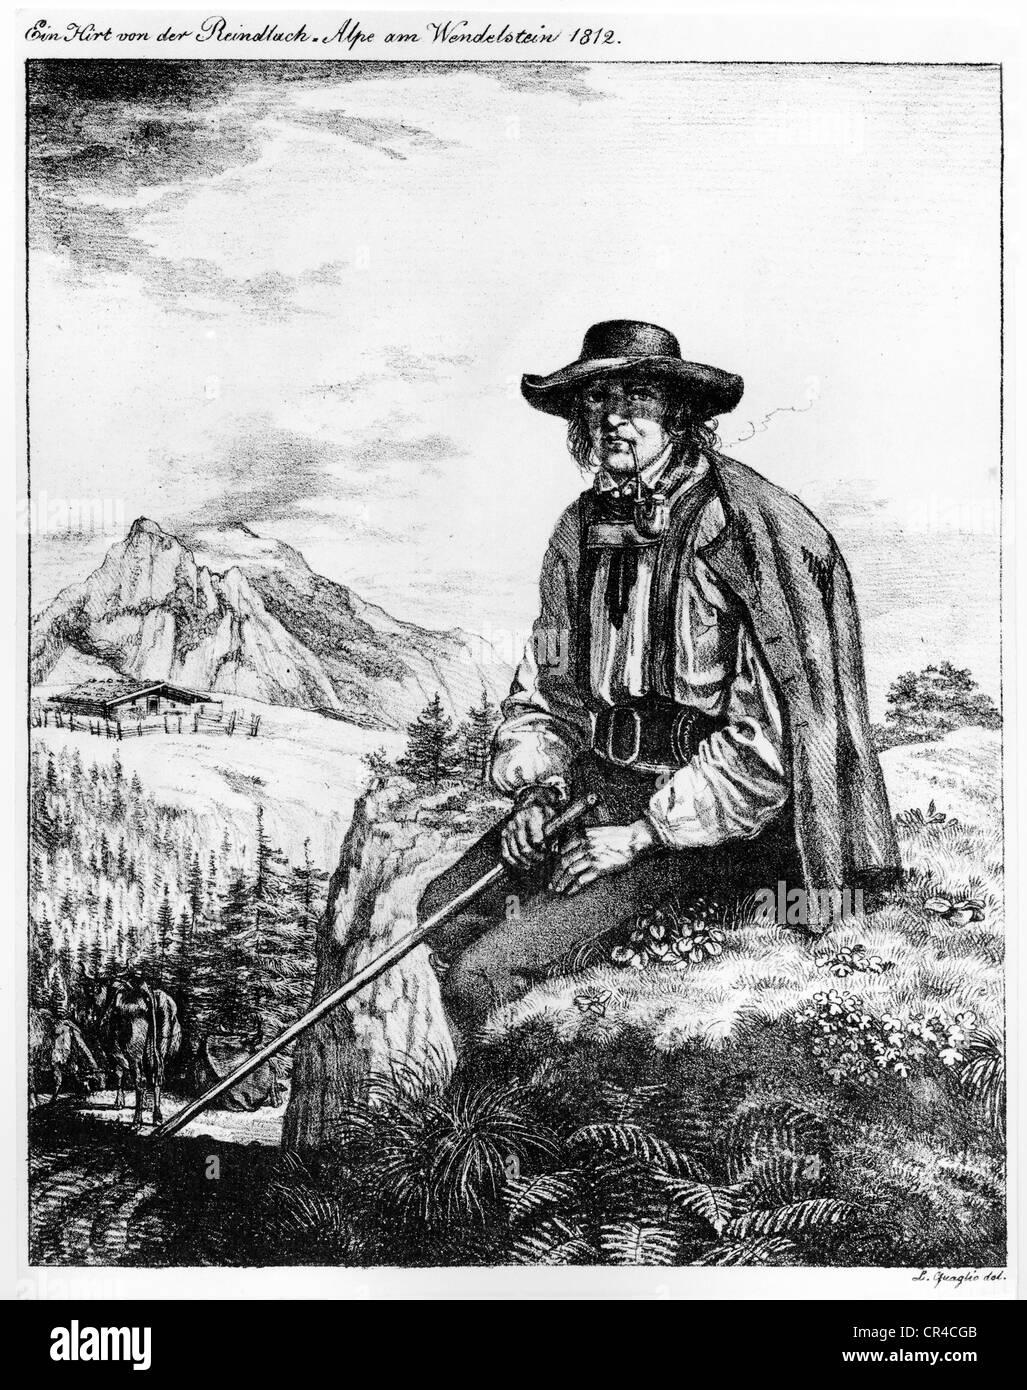 Herder, Reidlachalm, Wendelstein, Upper Bavaria, Germany, Europe, historical drawing by L. Quaglio, 1812 - Stock Image